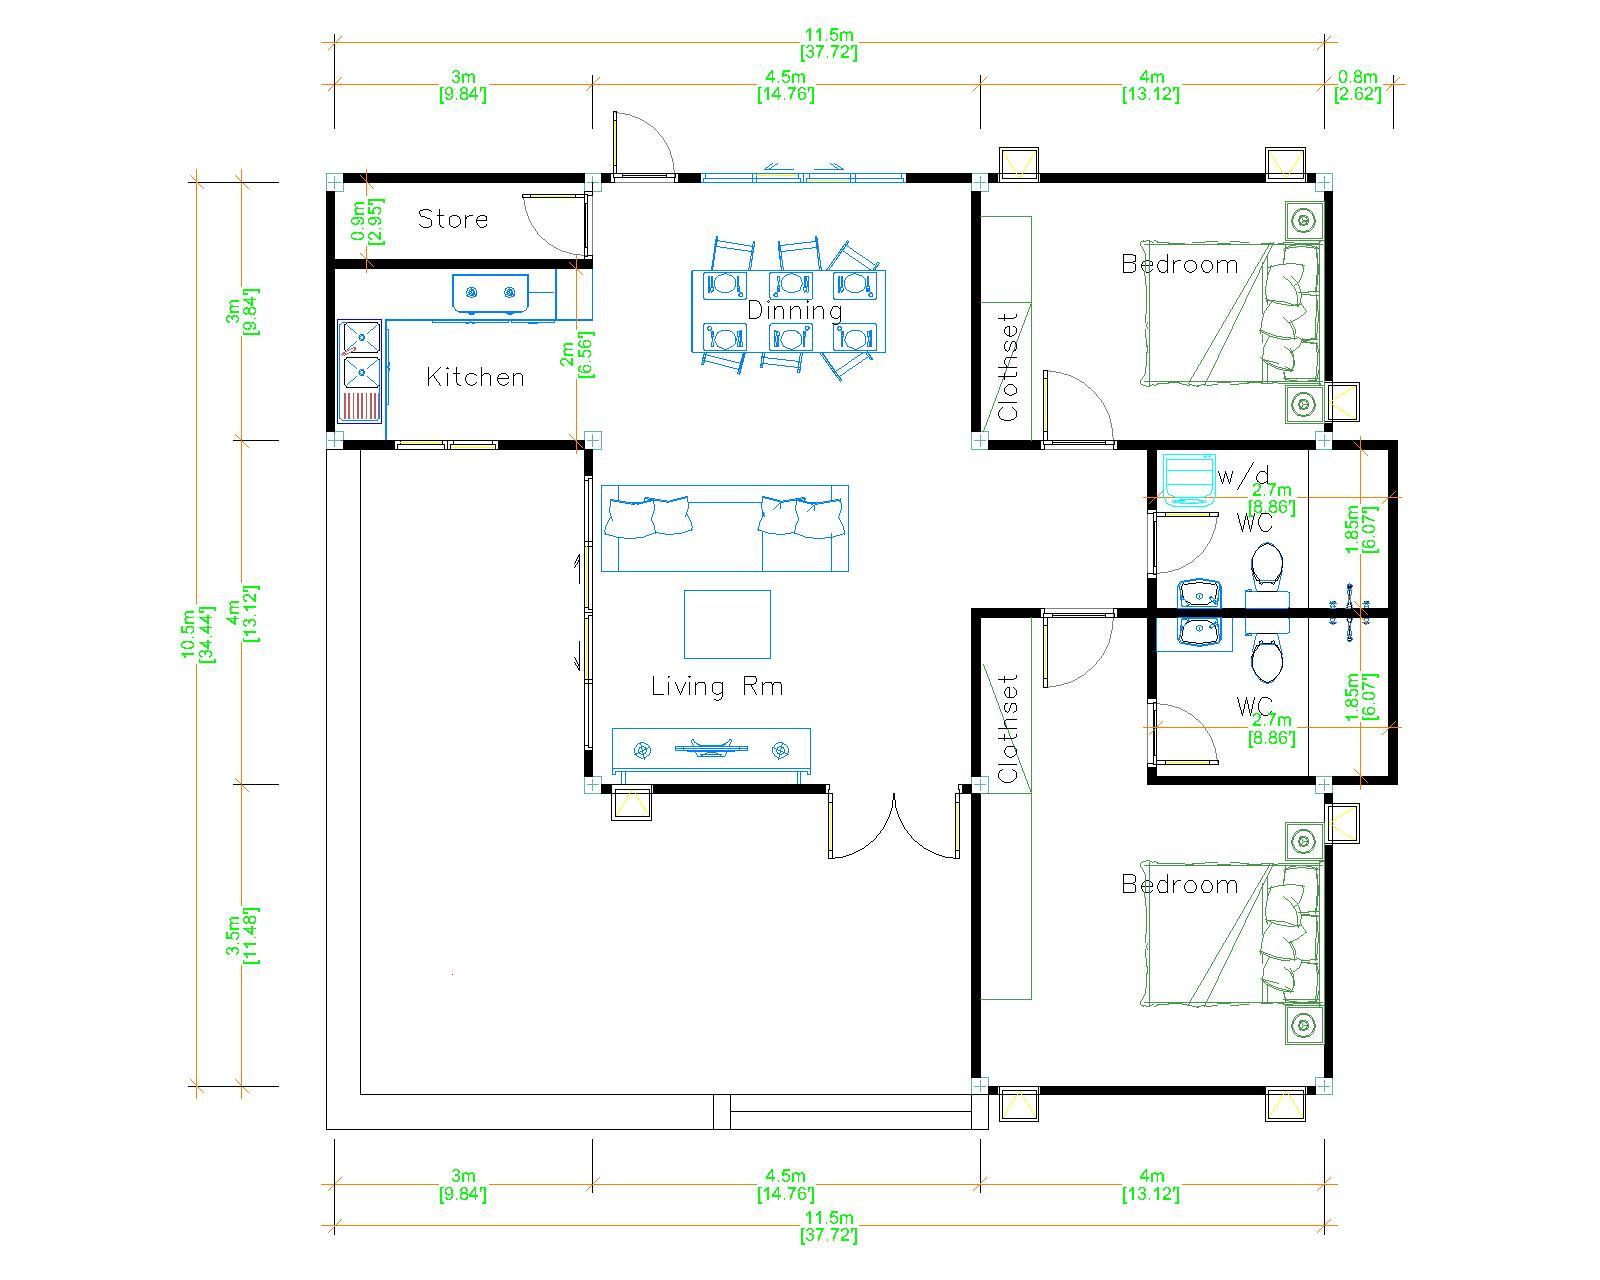 One Story Modern House 11.5x10.5 Meter 38x35 Feet 2 Beds layout floor plan